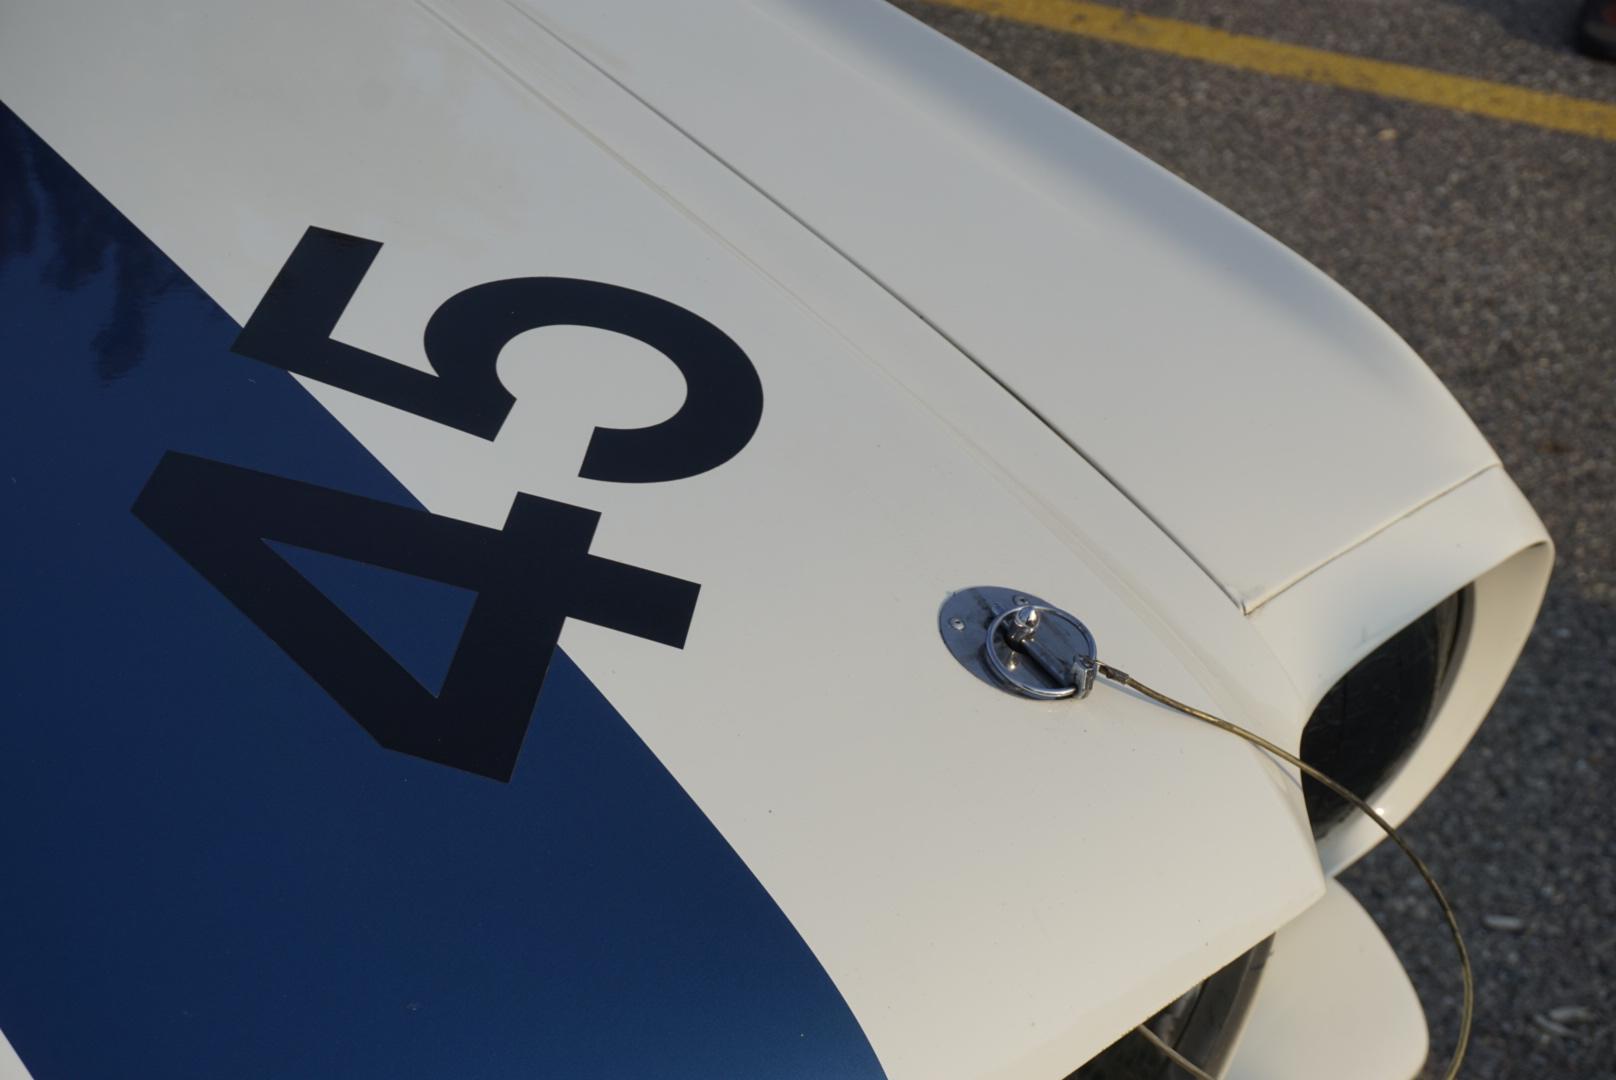 1965 Shelby GT350 hood pin